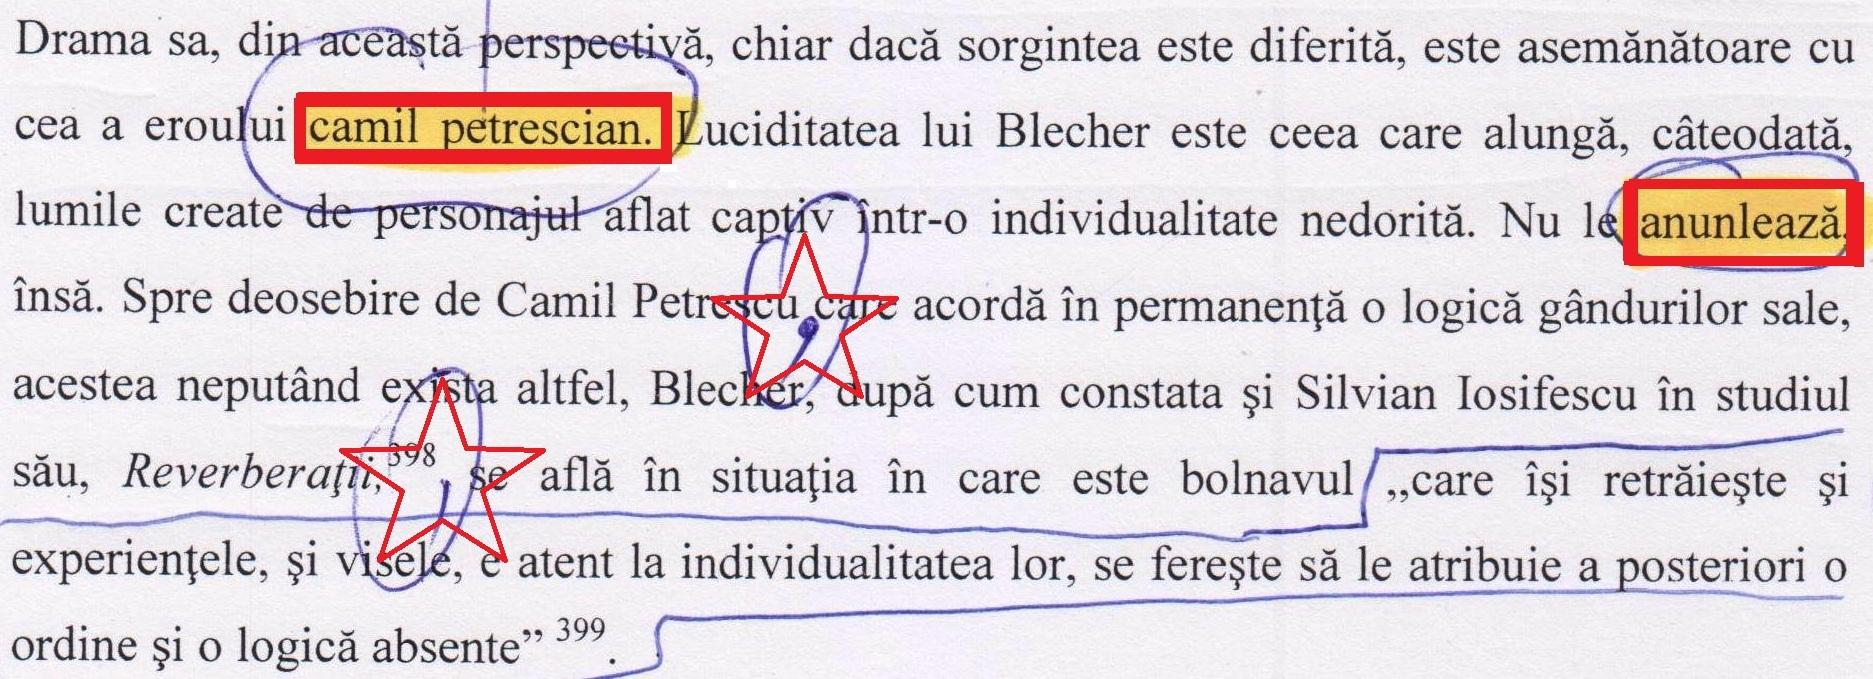 "Pag. 163: ""camil petrescian"", ""anunlează""."